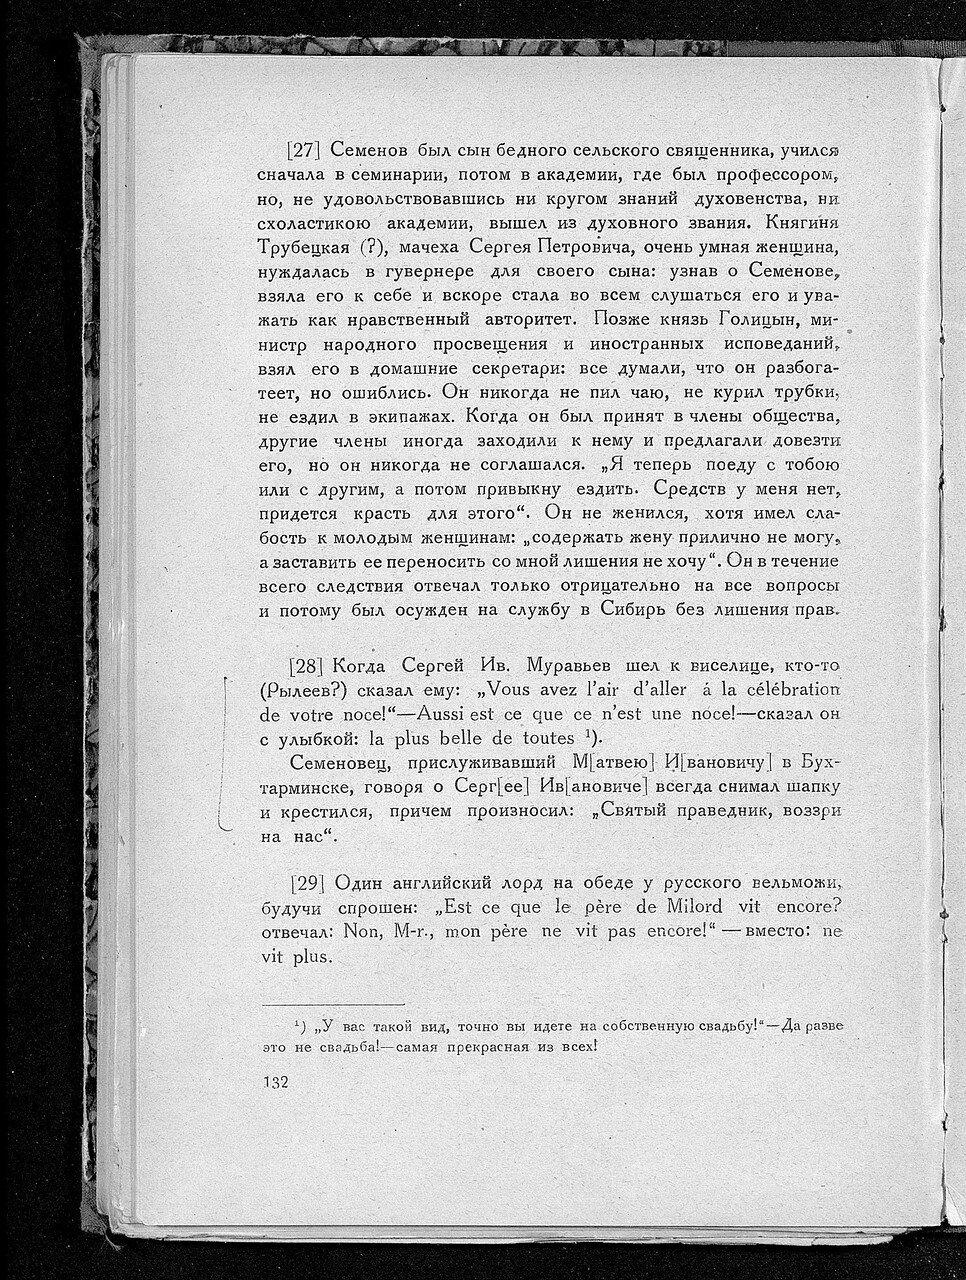 https://img-fotki.yandex.ru/get/368754/199368979.a2/0_21437d_ea7468c2_XXXL.jpg